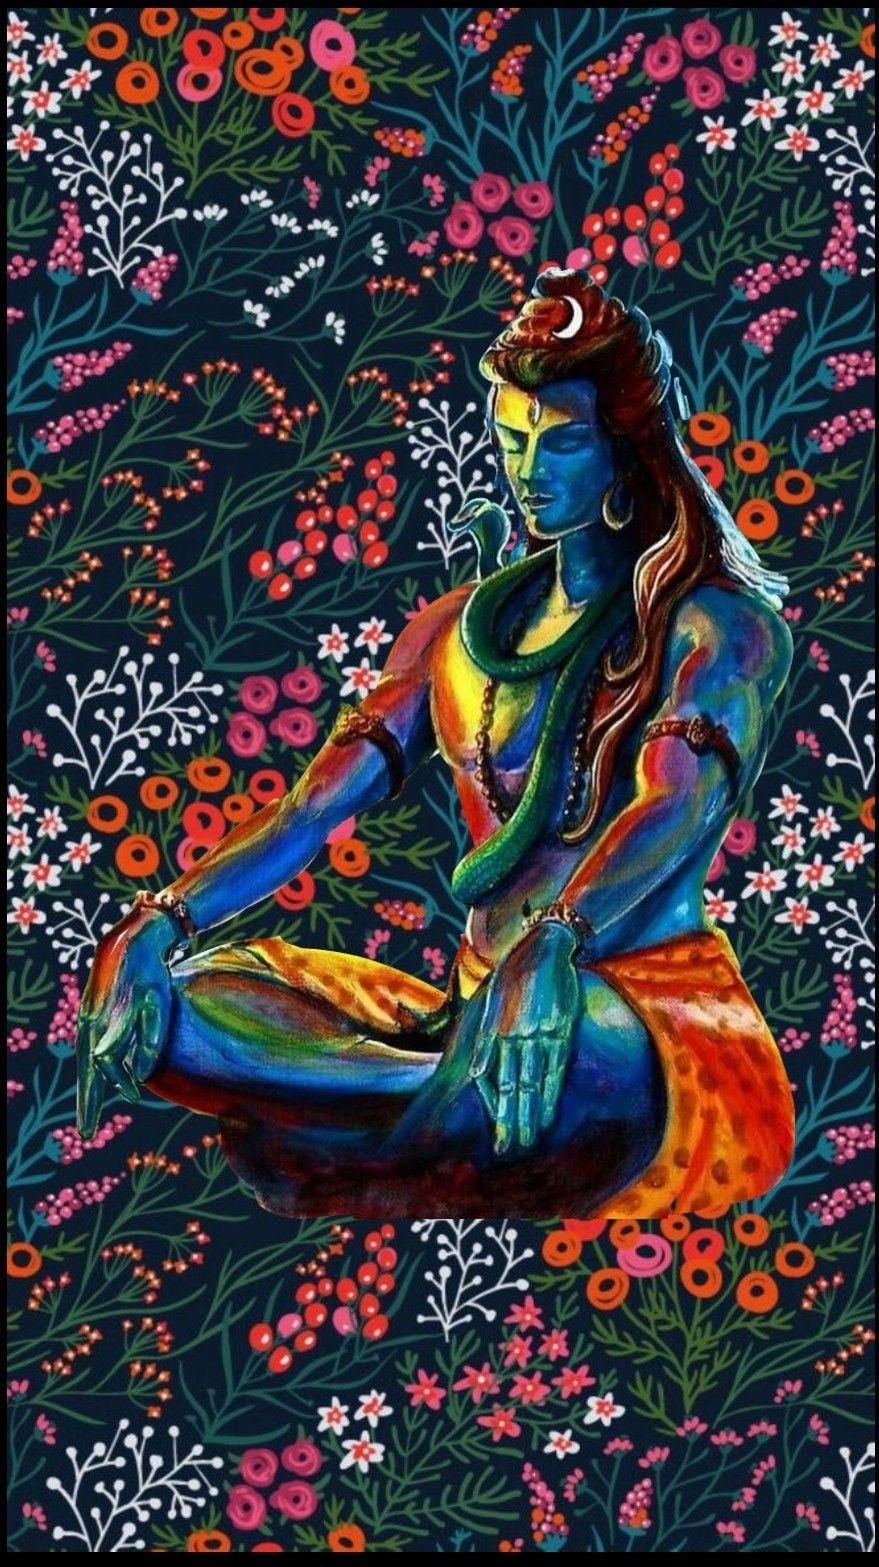 Pin By Khiladio Ka Badshah On Lord Shiva Lord Shiva Painting